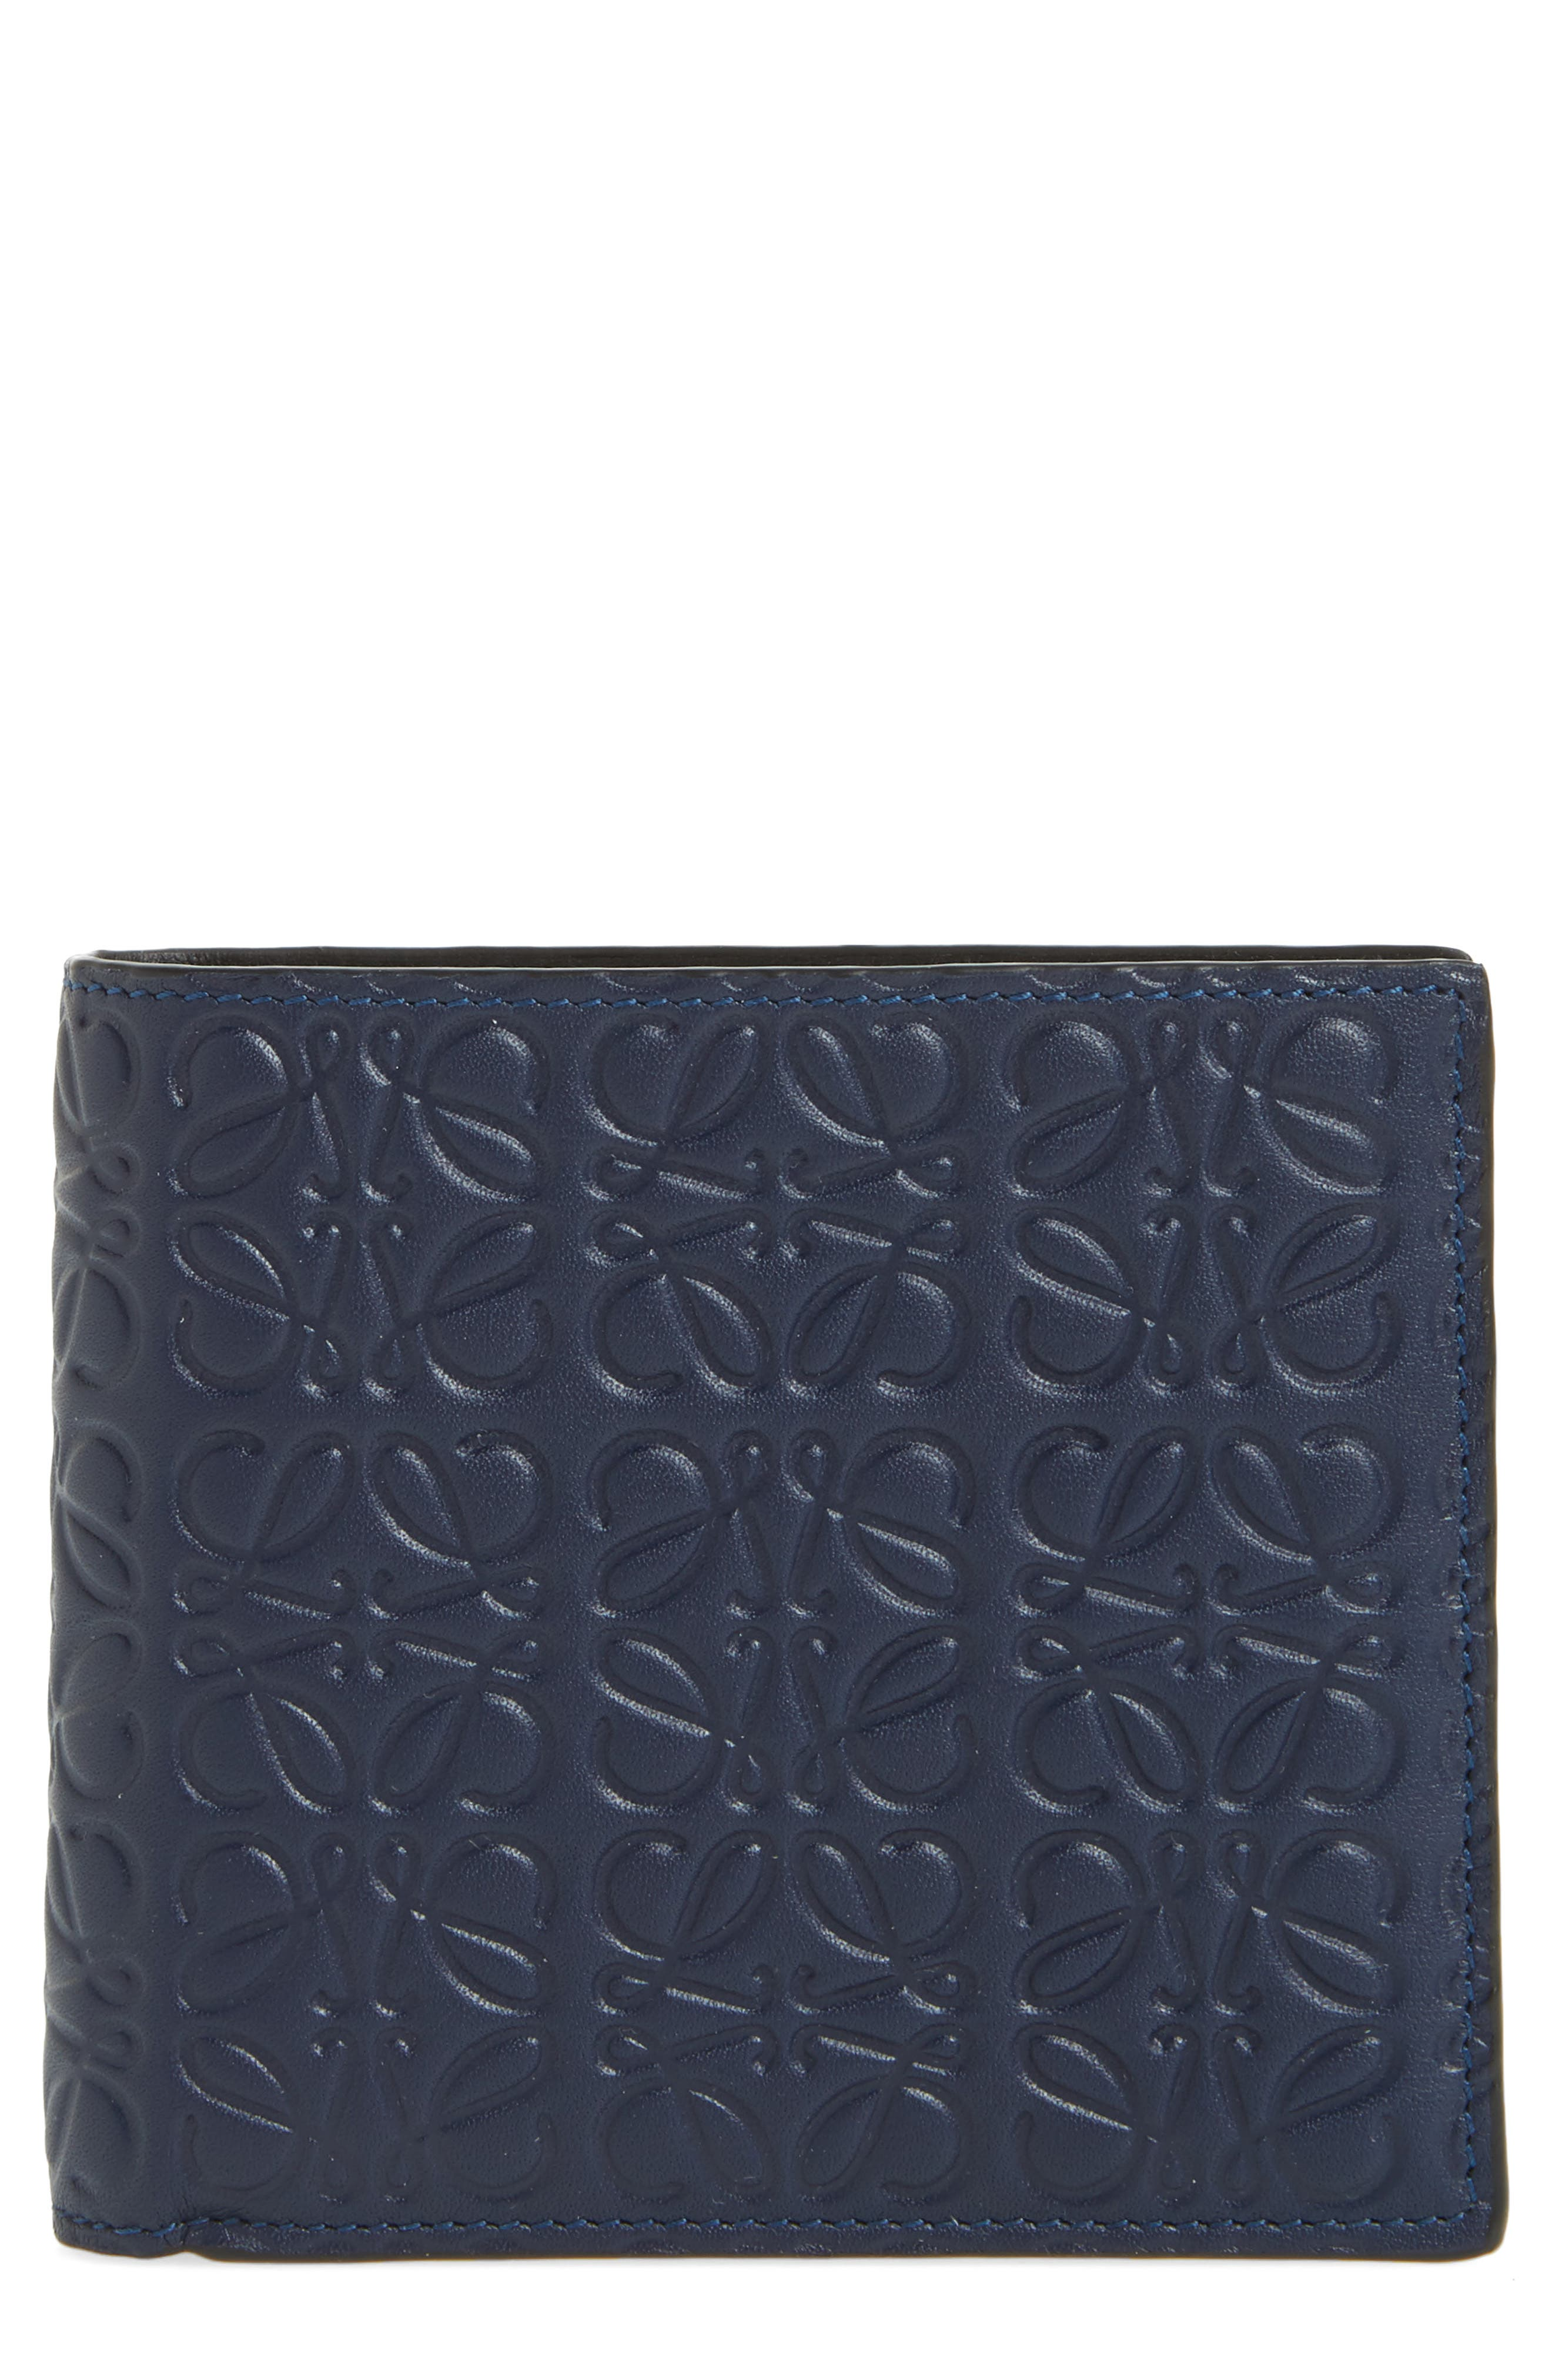 Alternate Image 1 Selected - Loewe Bifold Leather Wallet